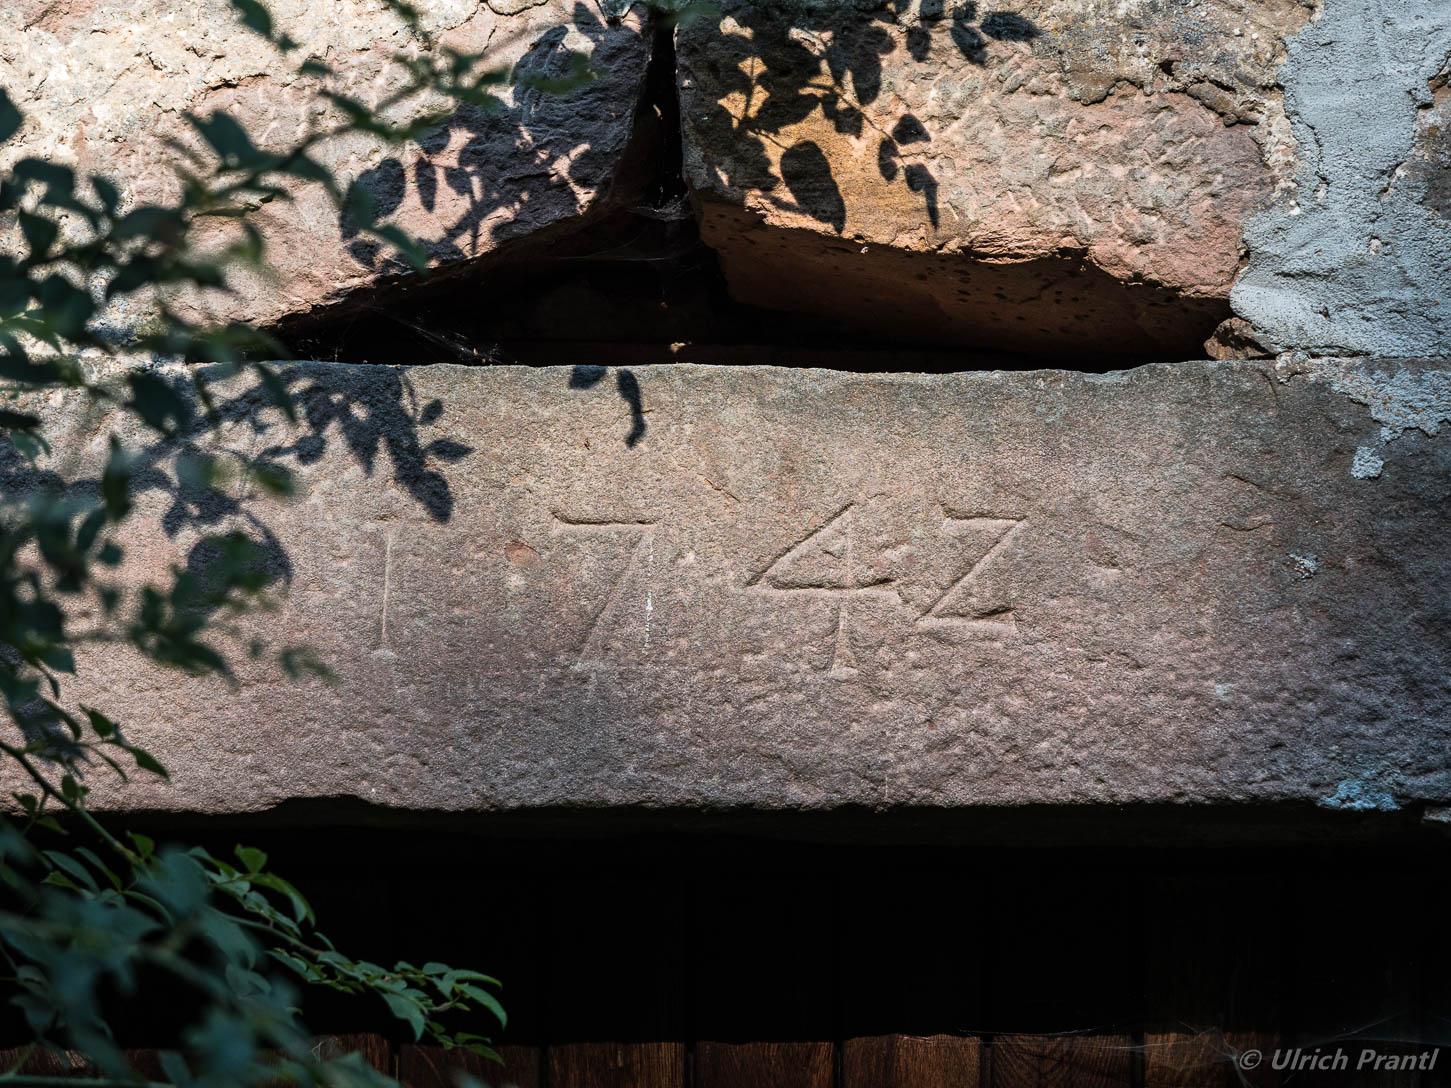 Rothenbuch Mühle